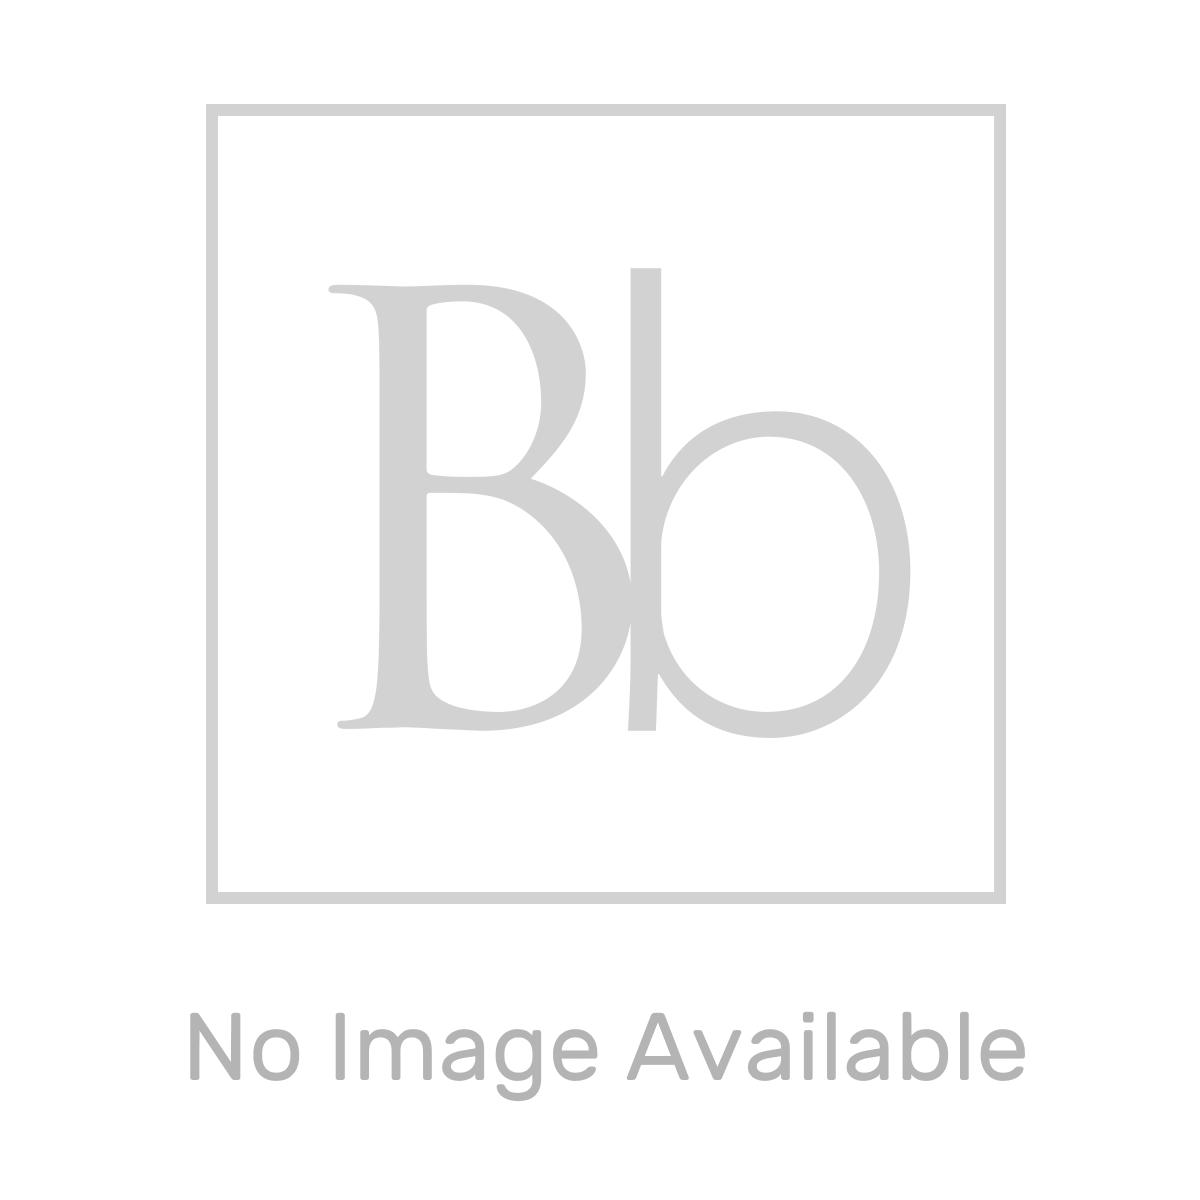 Homelux PVC Straight Edge 10mm Soft Cream Tile Trim 2.5m